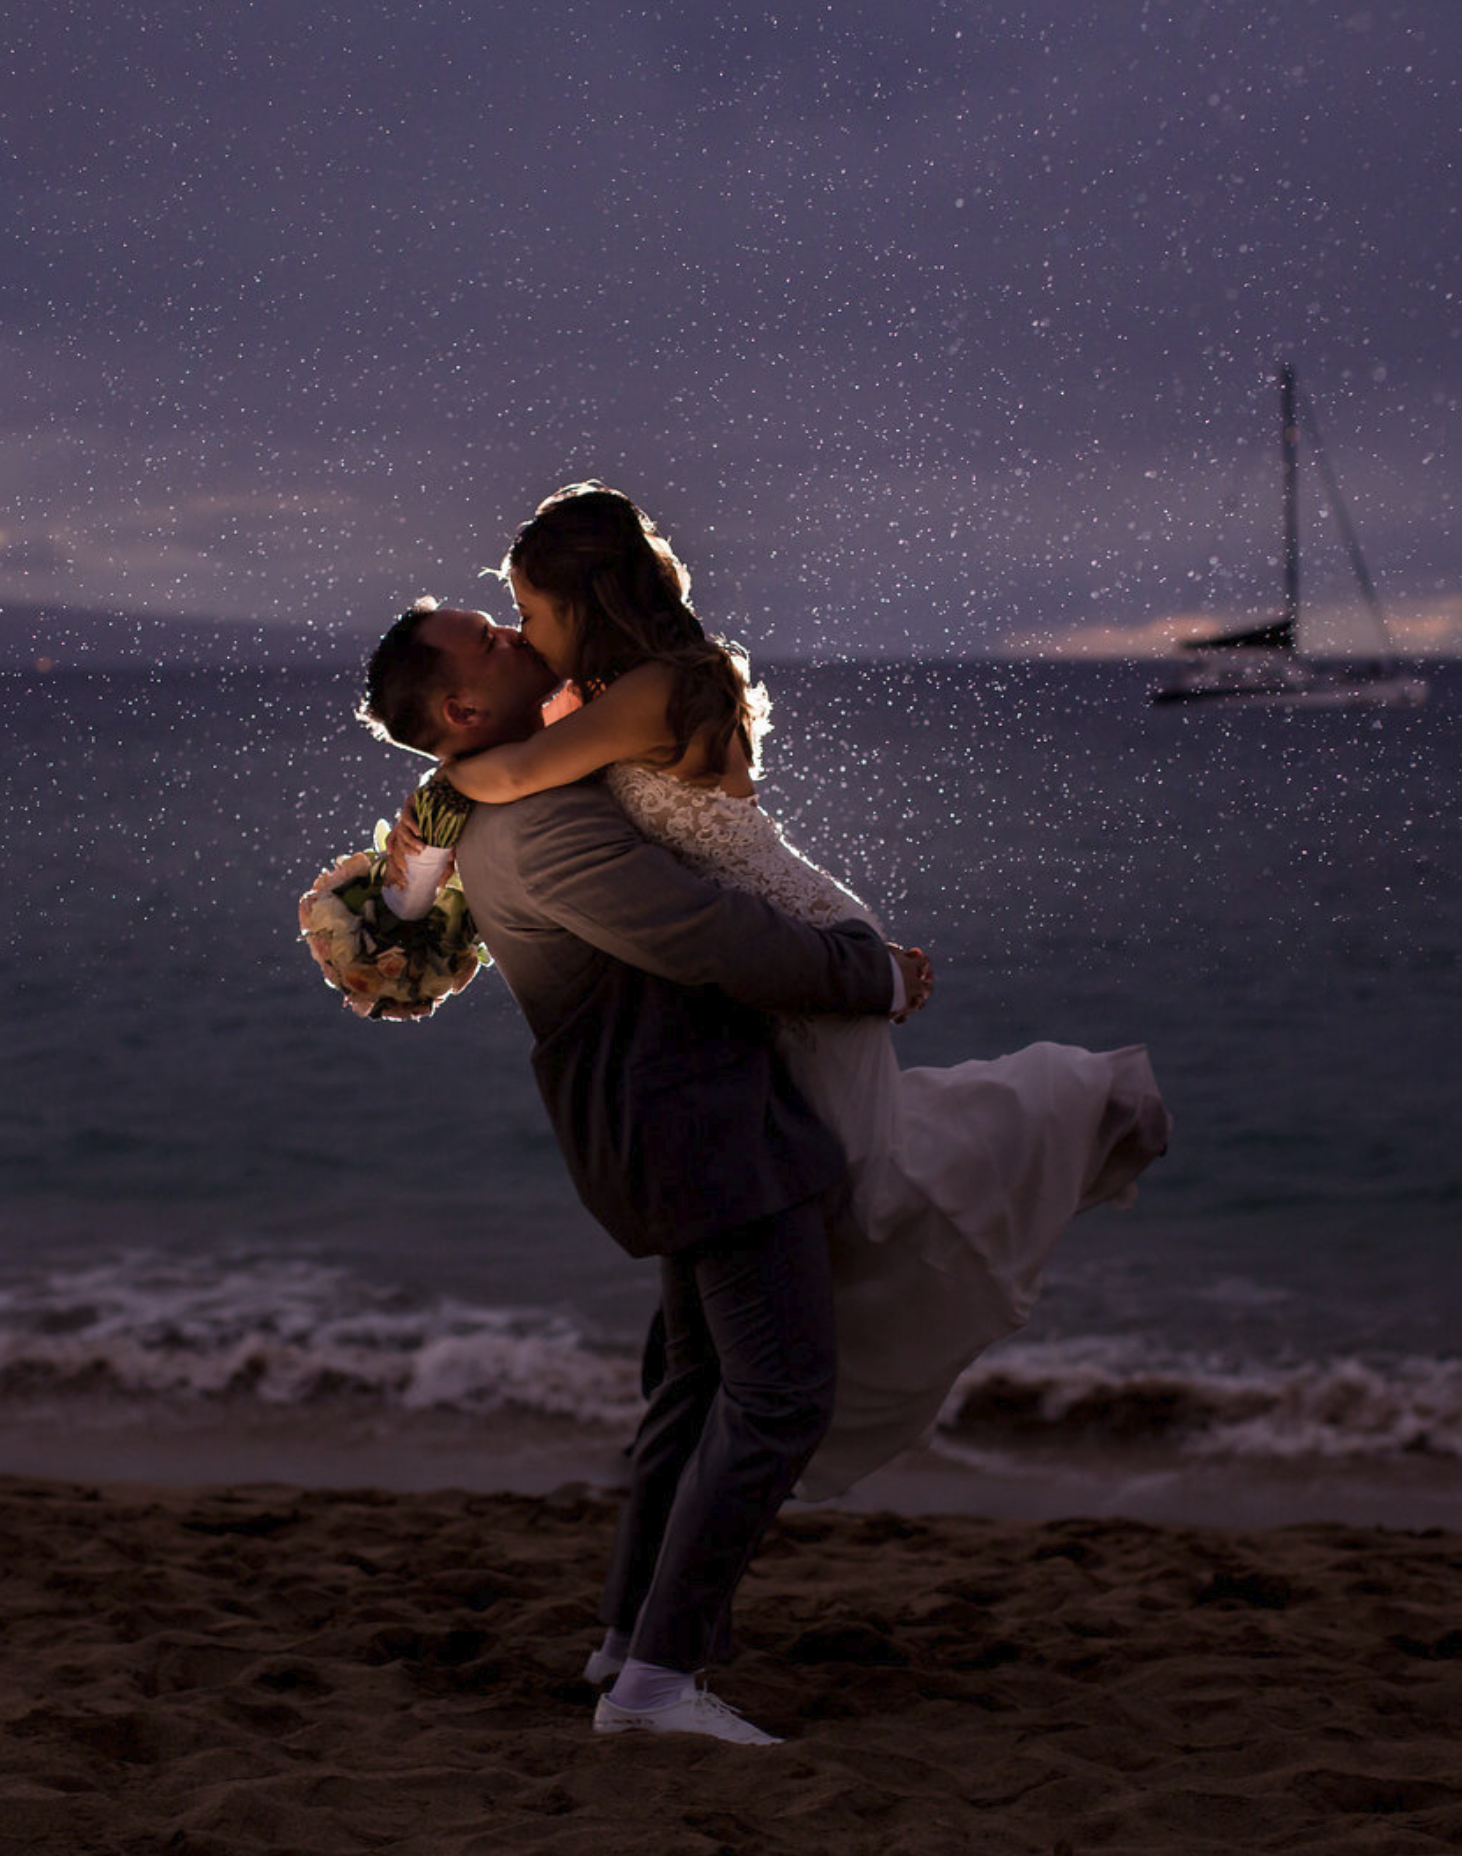 chris-j-evans-rain-wedding00001.png